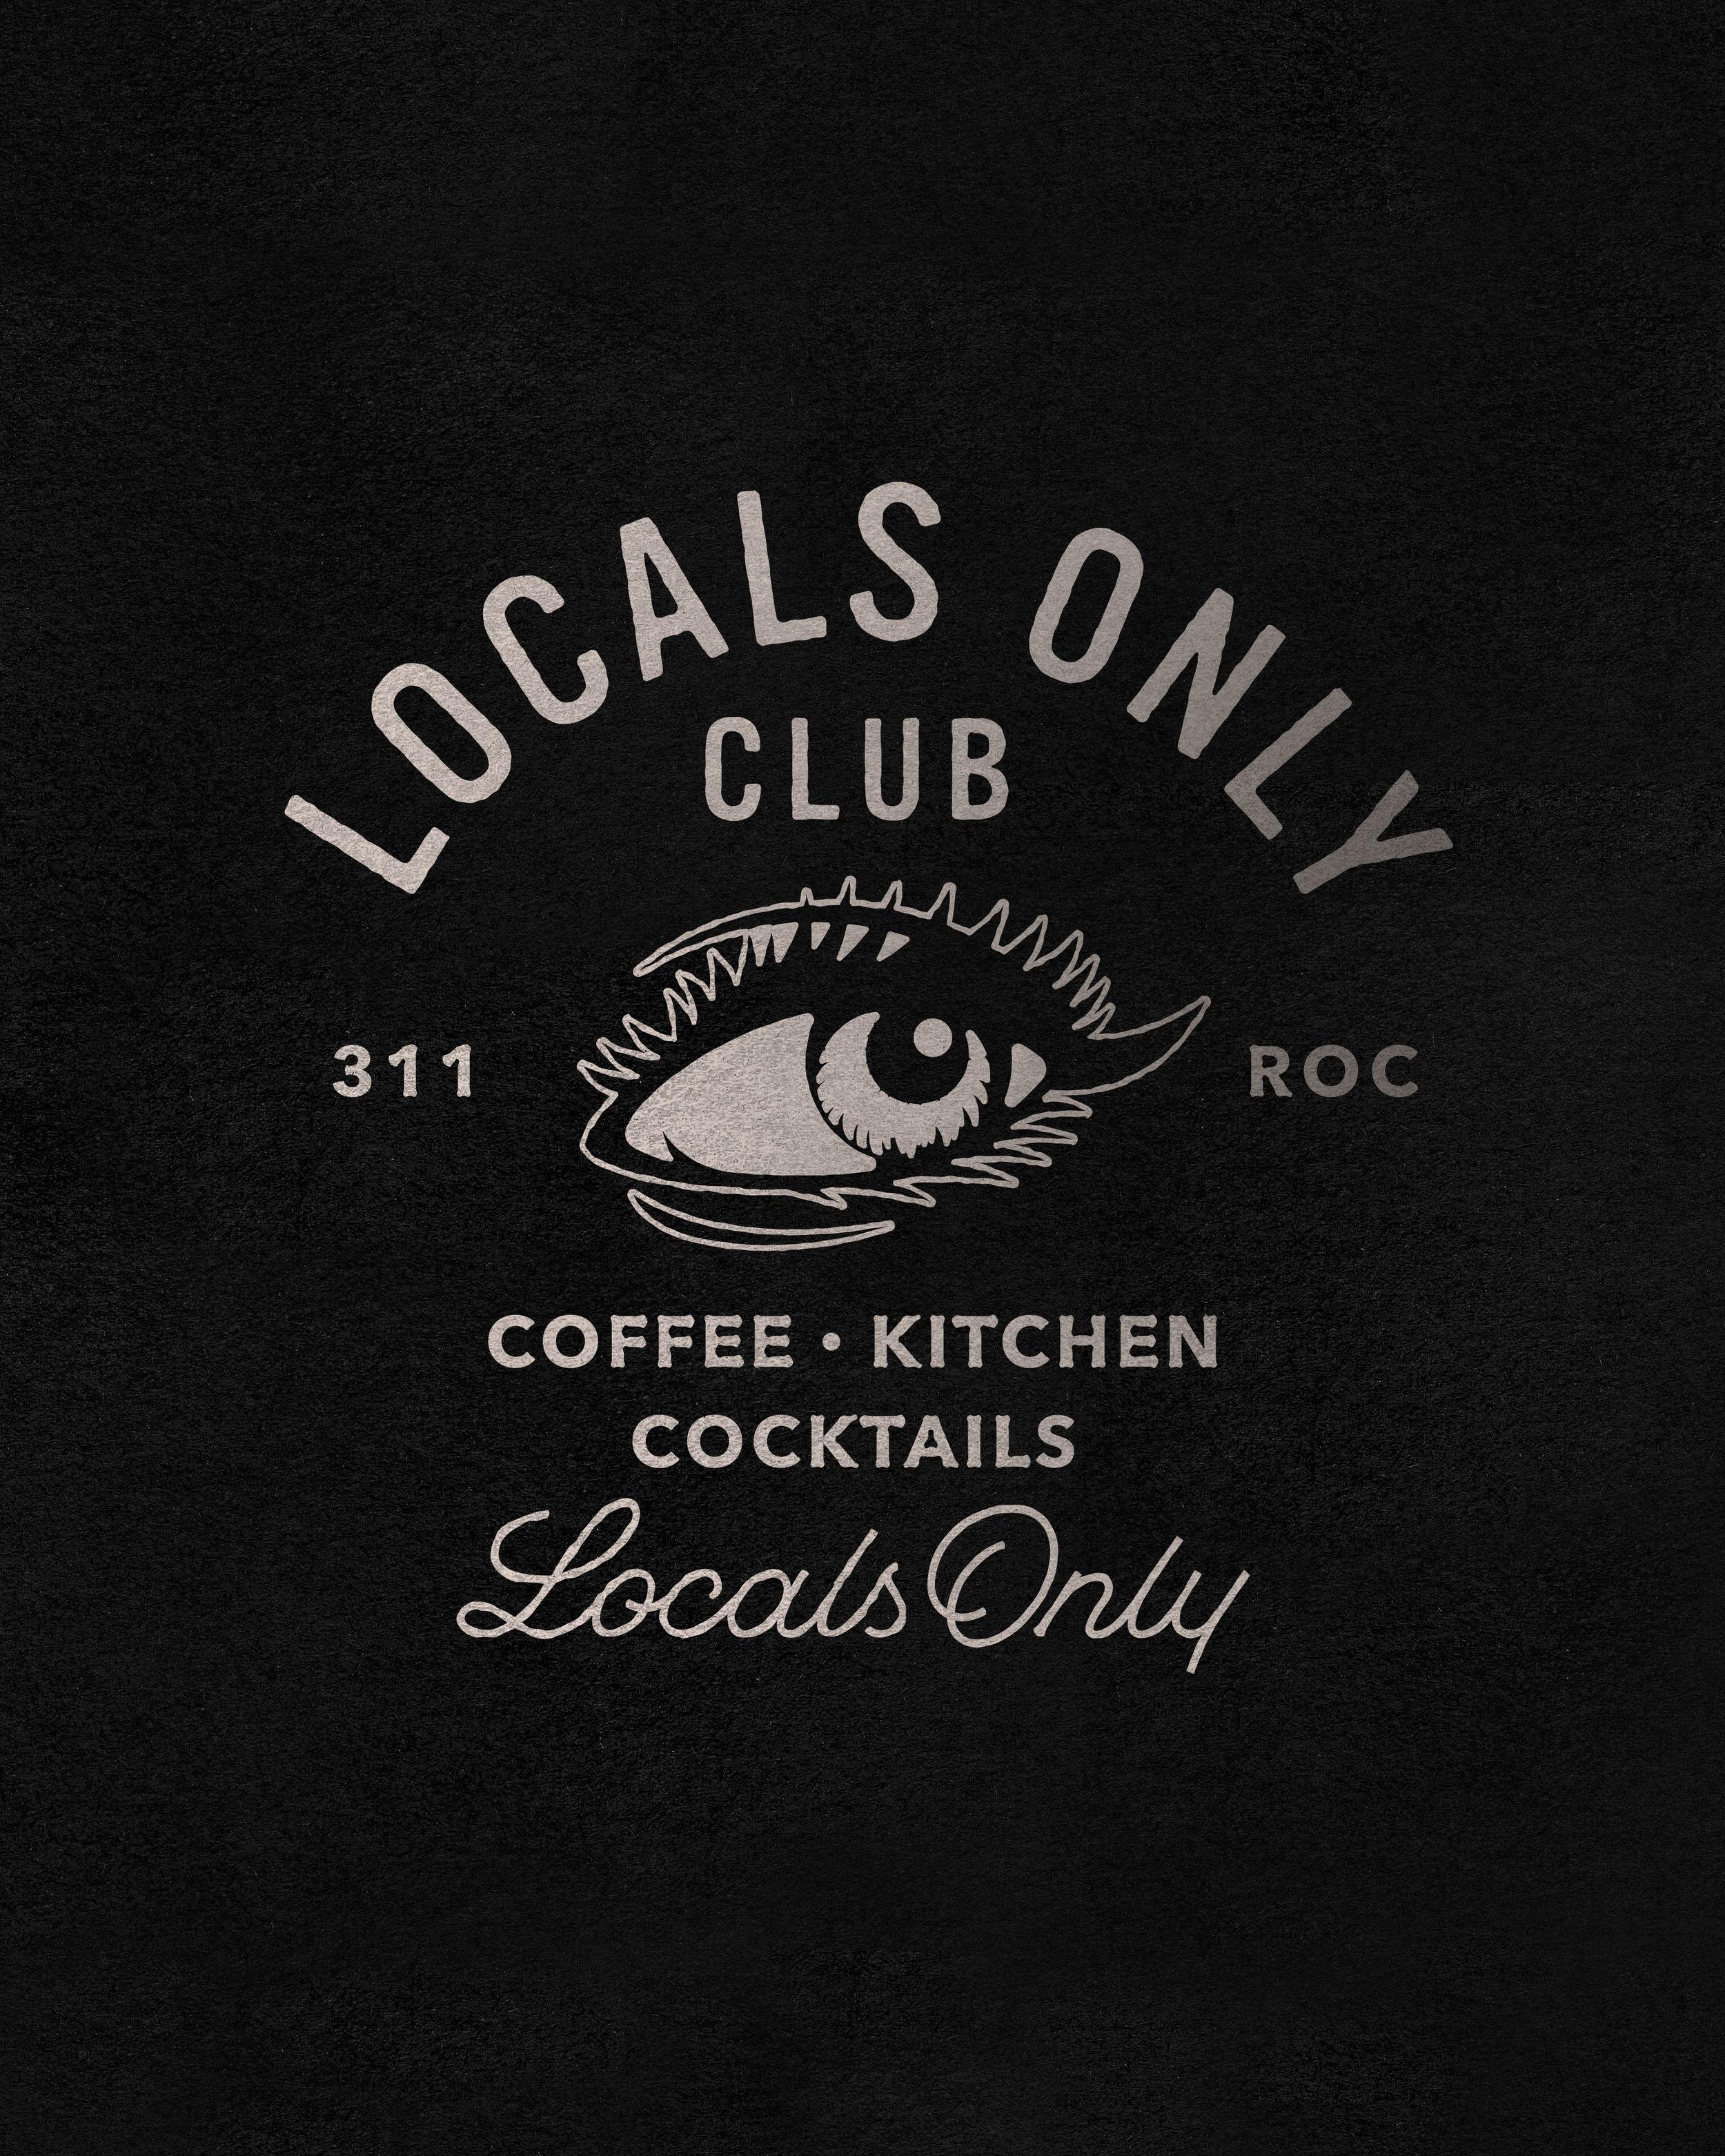 LocalsOnlyClub.jpg